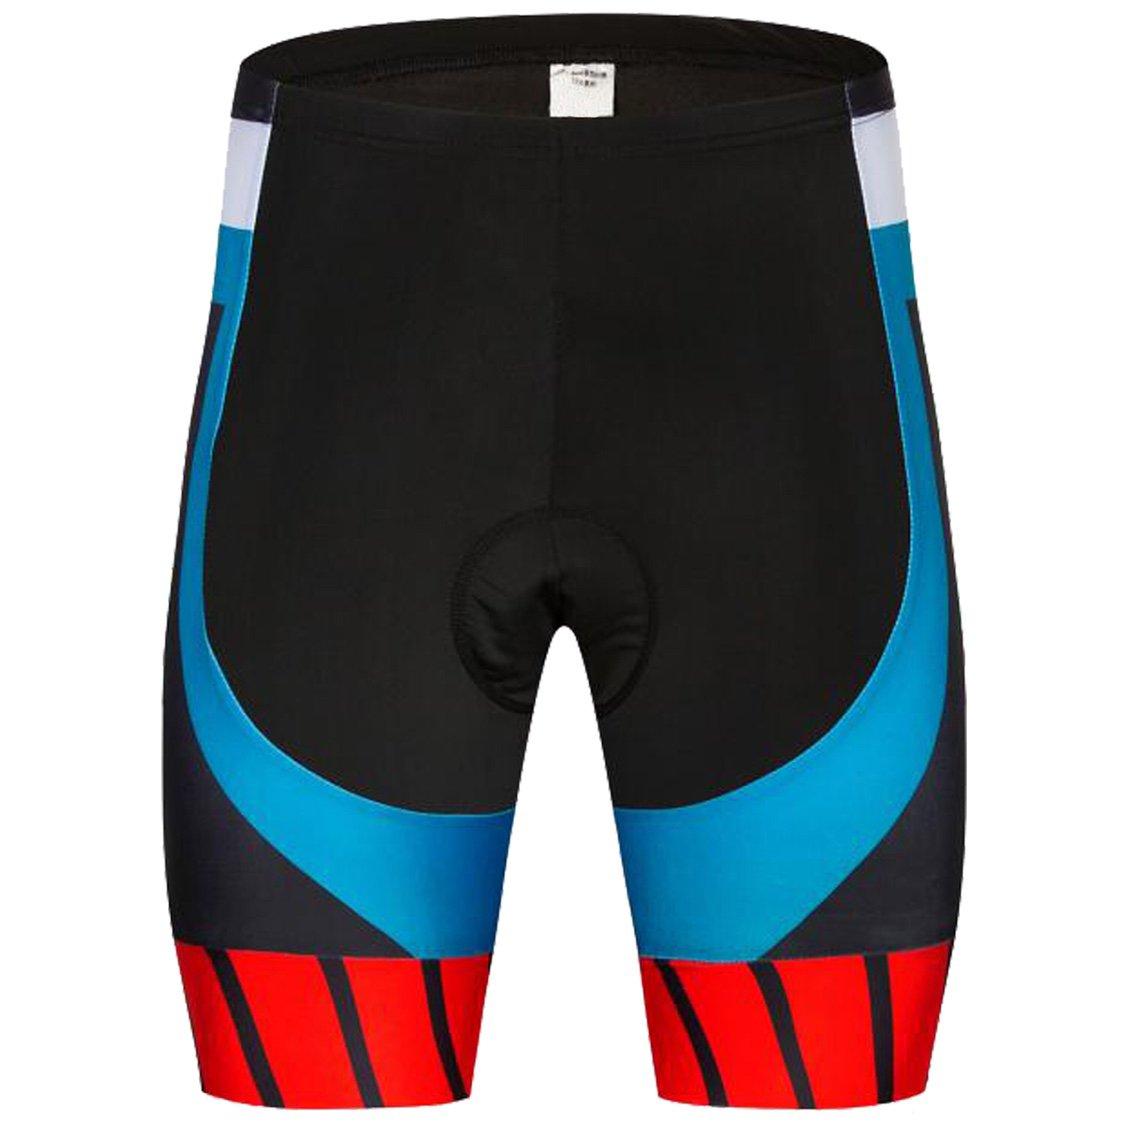 AKAAYUKO Cycling Shorts Men Padded Bicycle Riding Pants Bike Biking Cycle Wear Tights